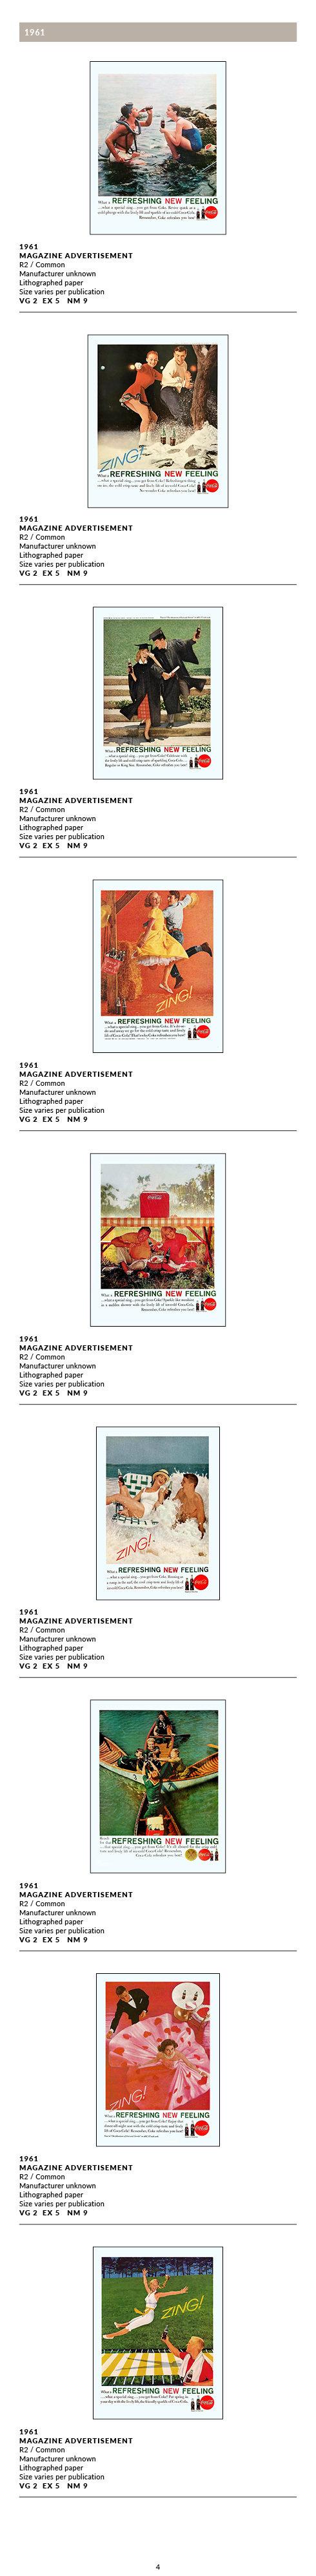 Desktop 1960-64 Ads Master4.jpg